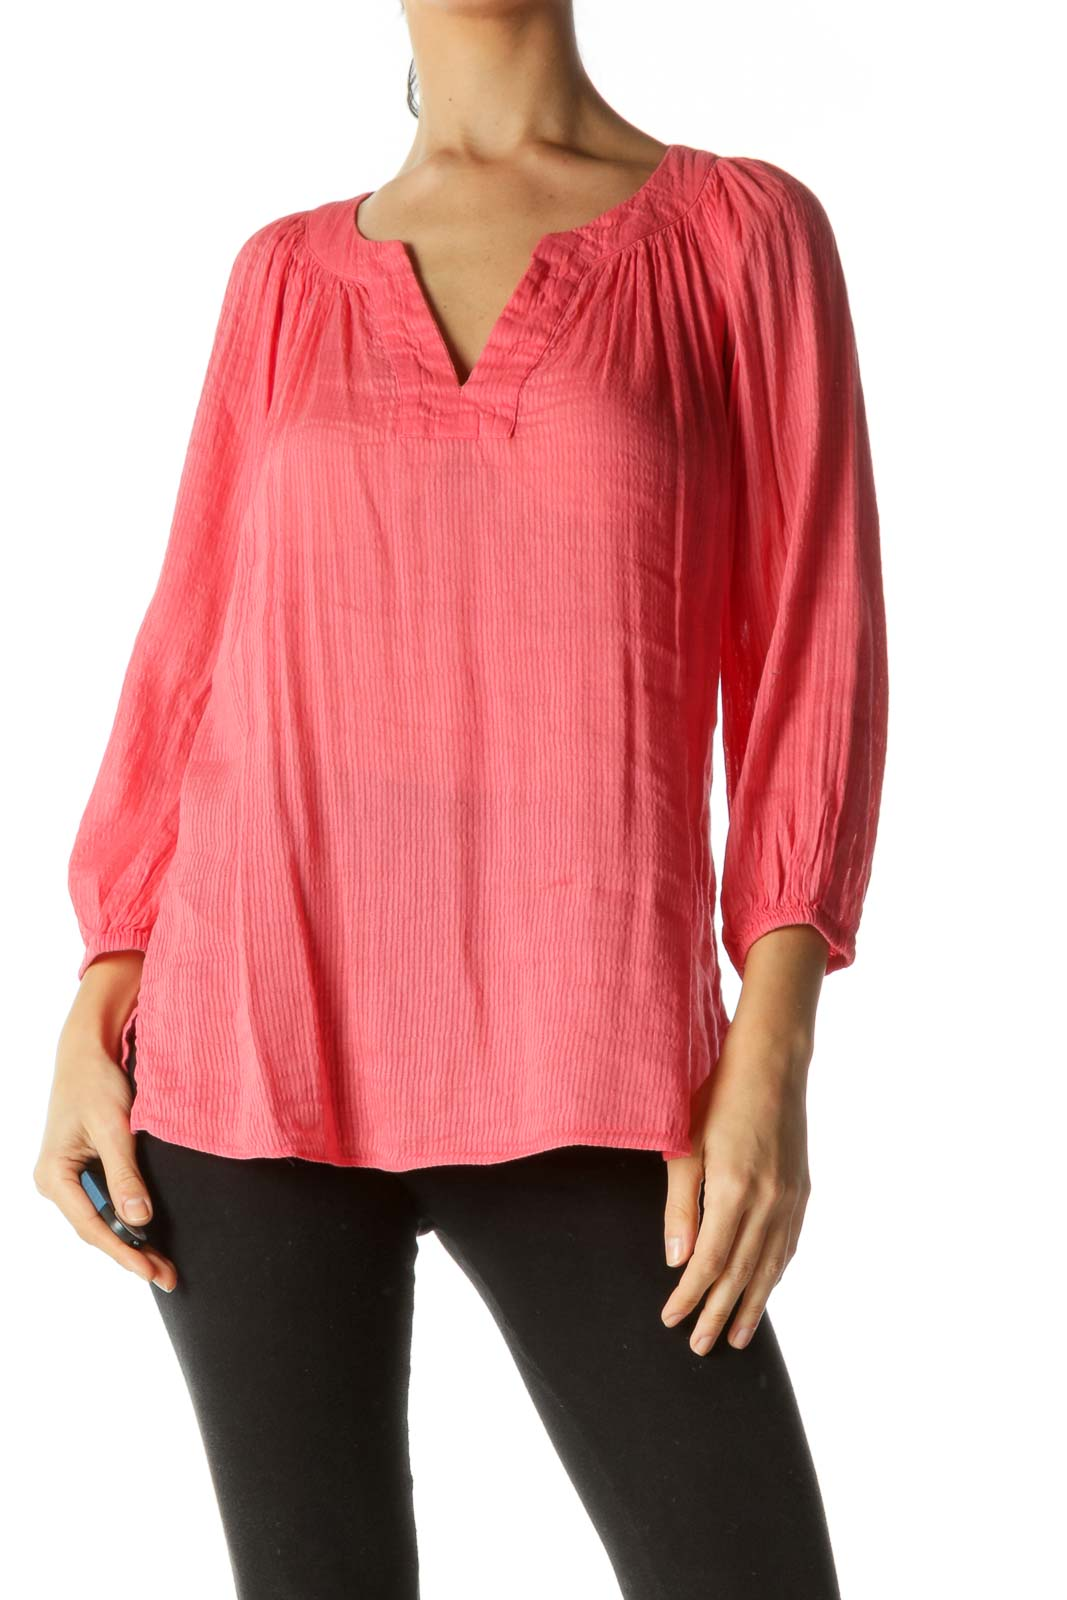 Coral Pink V-Neck Linen Blend Tunic Top Front